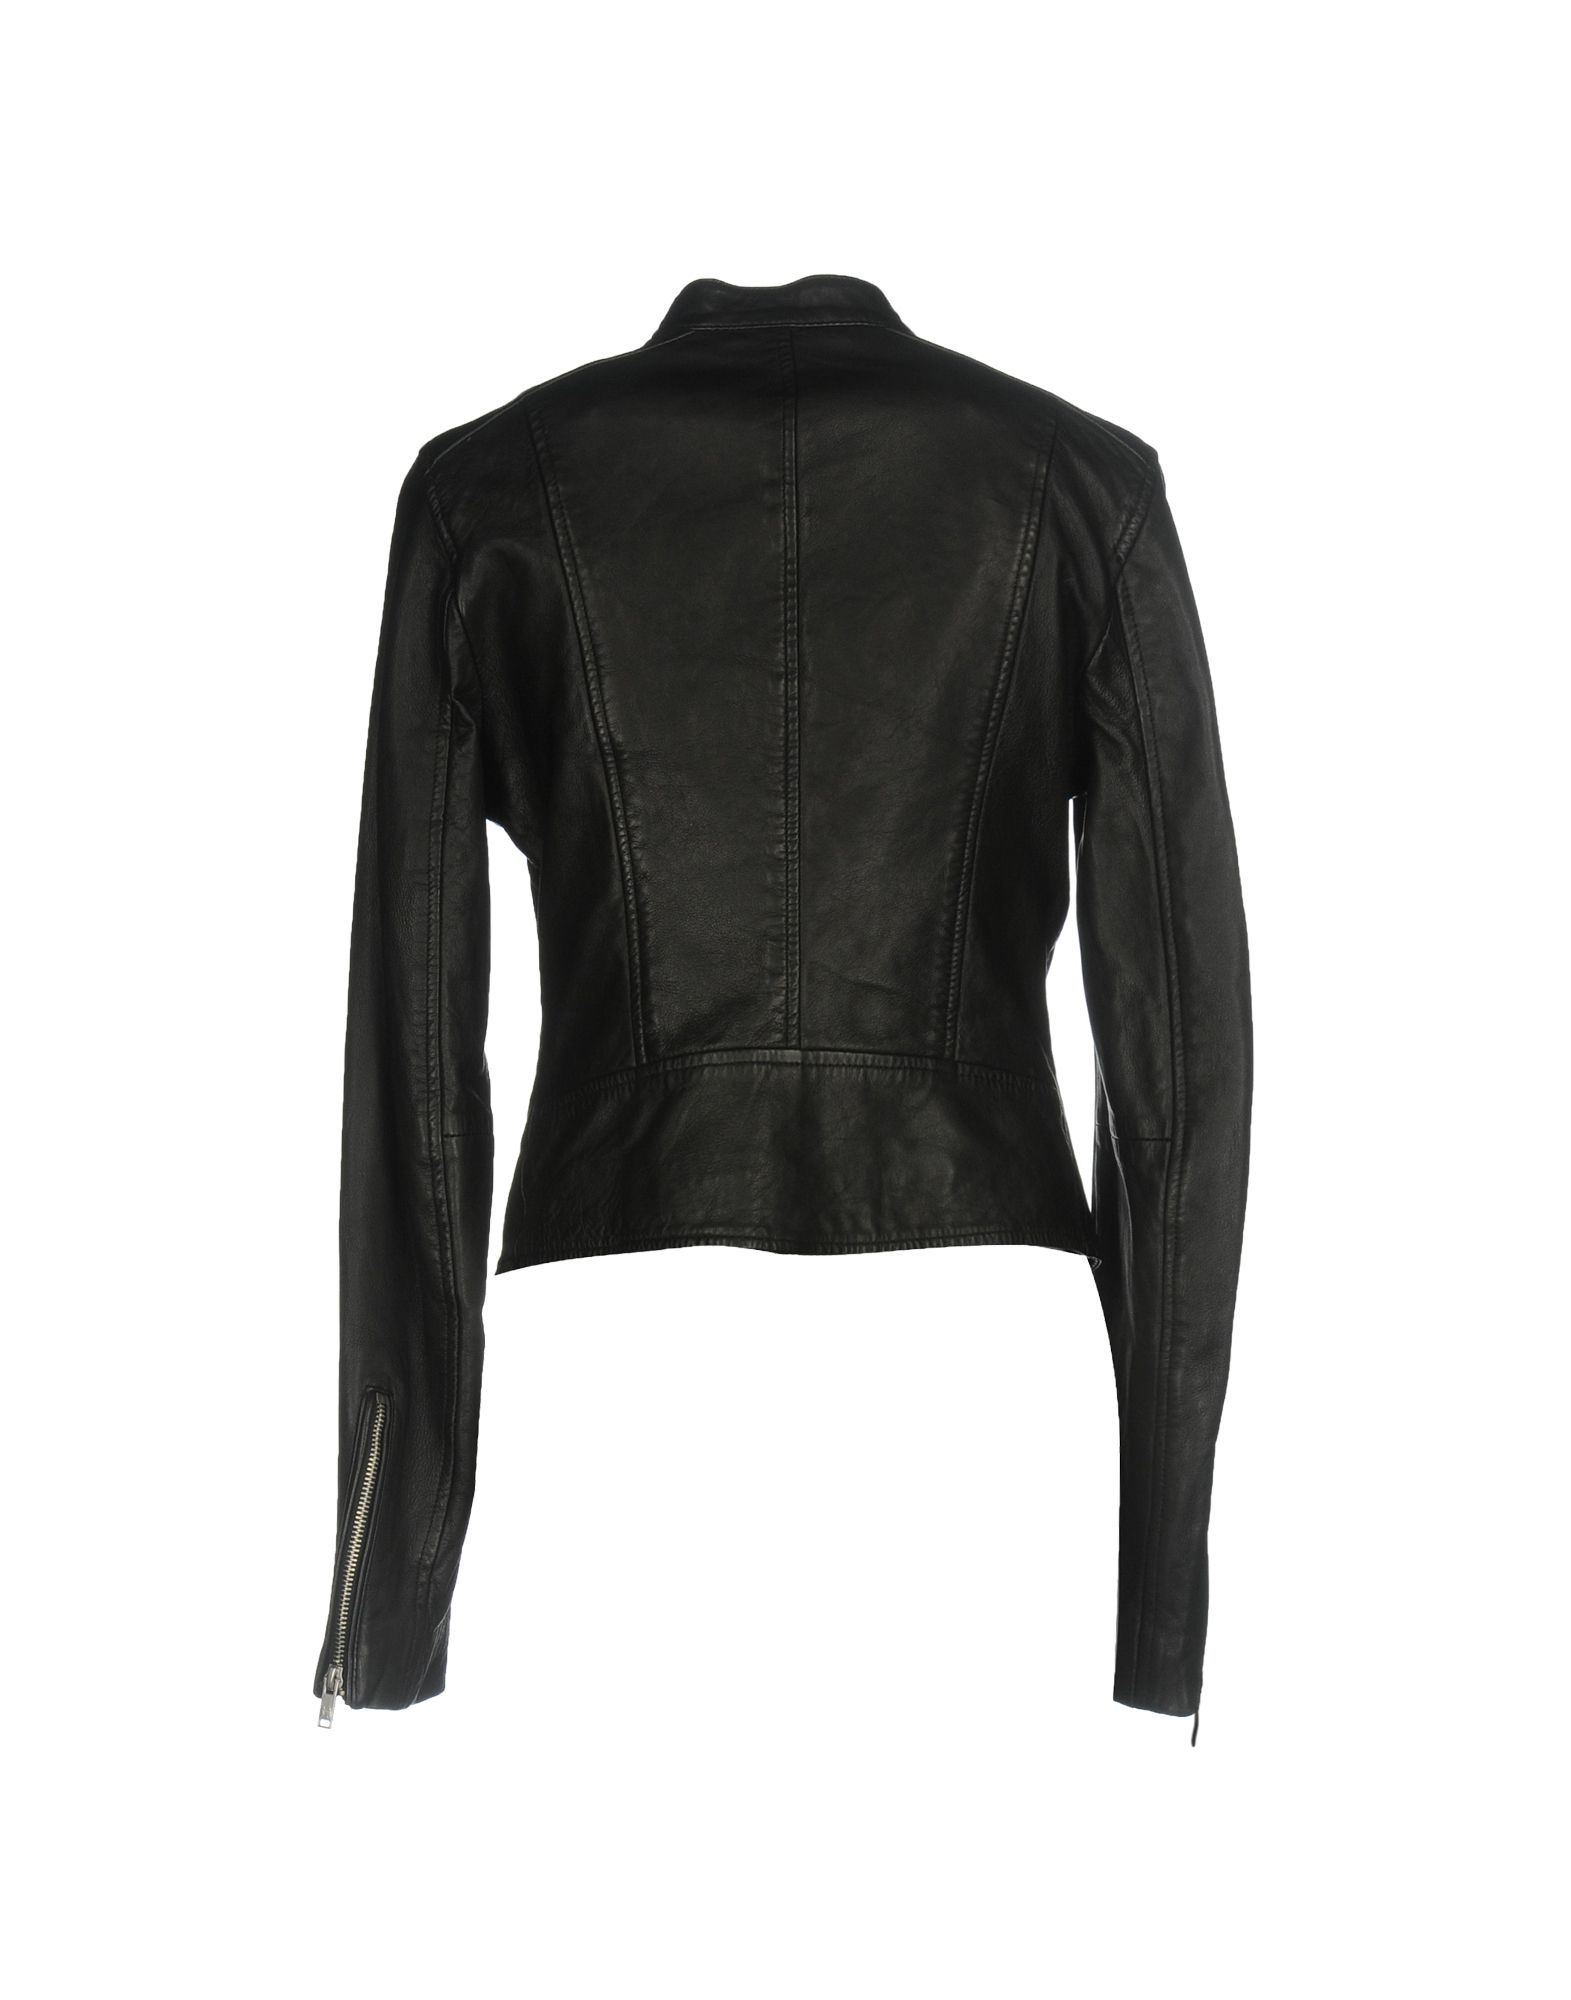 Superdry Woman Black Jackets